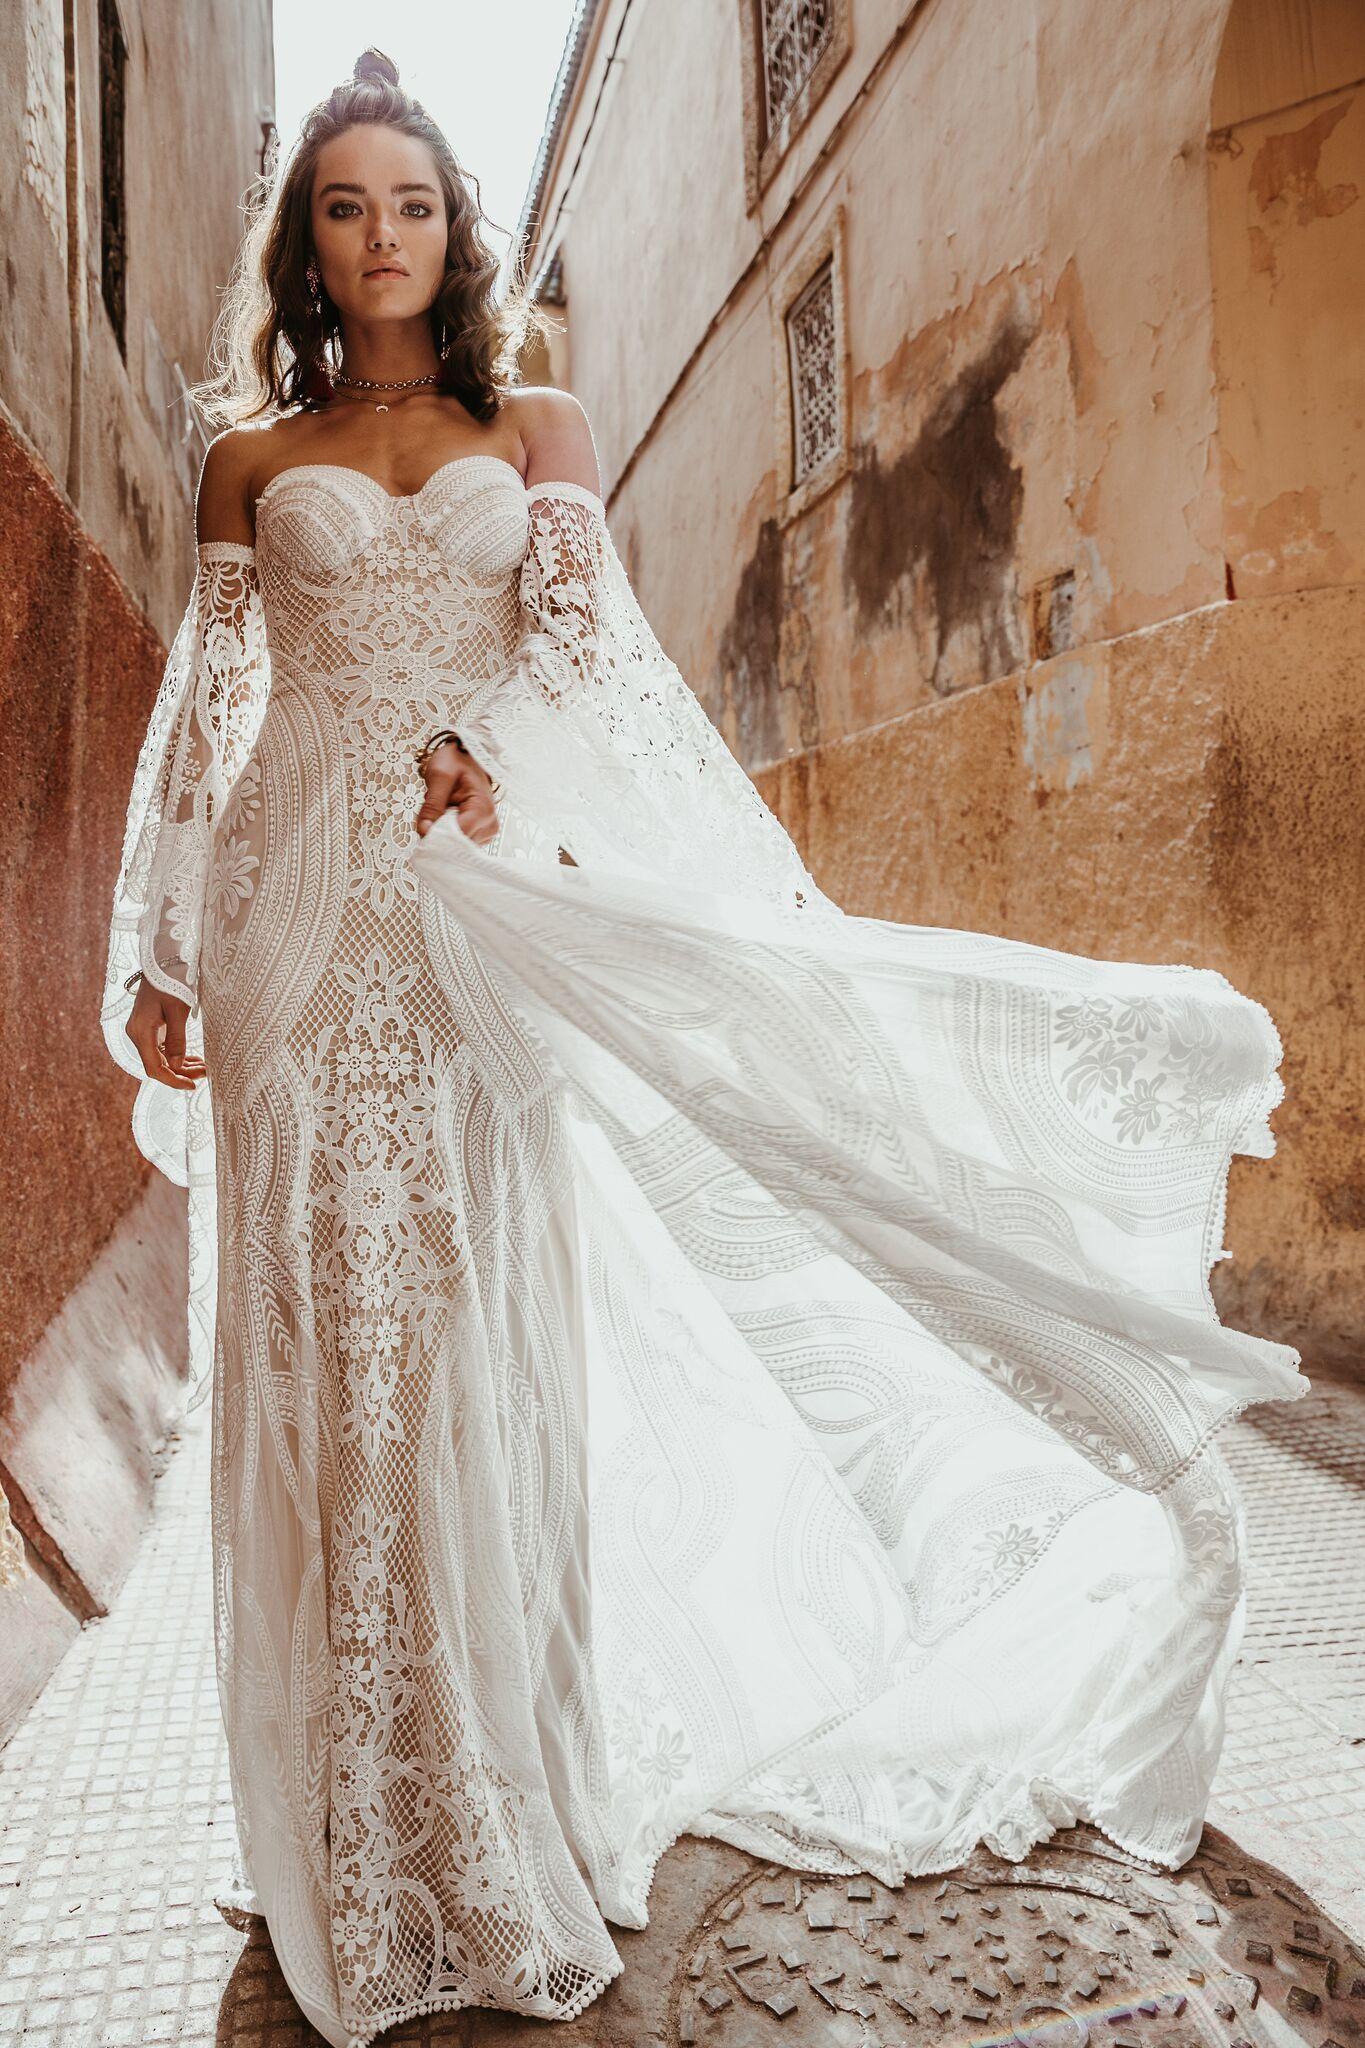 Lightweight wedding dresses  New Rue De Seine Wedding Dresses  Trunk Shows  Wedding Stuff